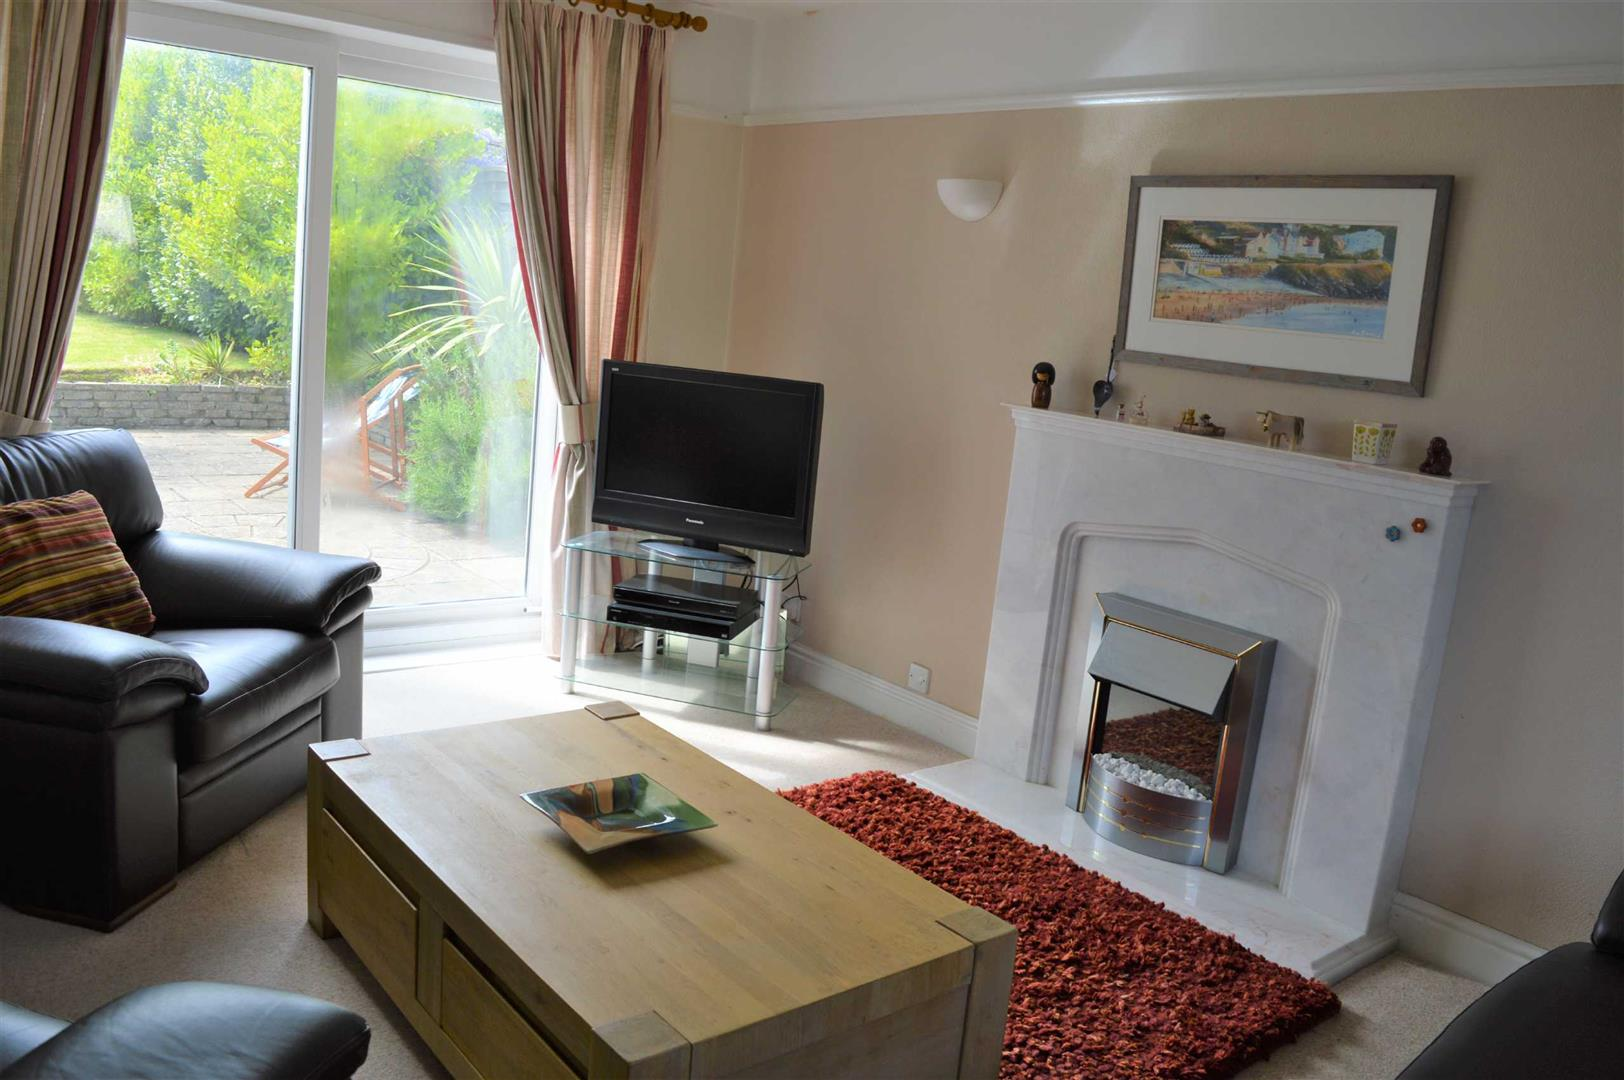 Beaufort Avenue, Langland, Swansea, SA3 4PB